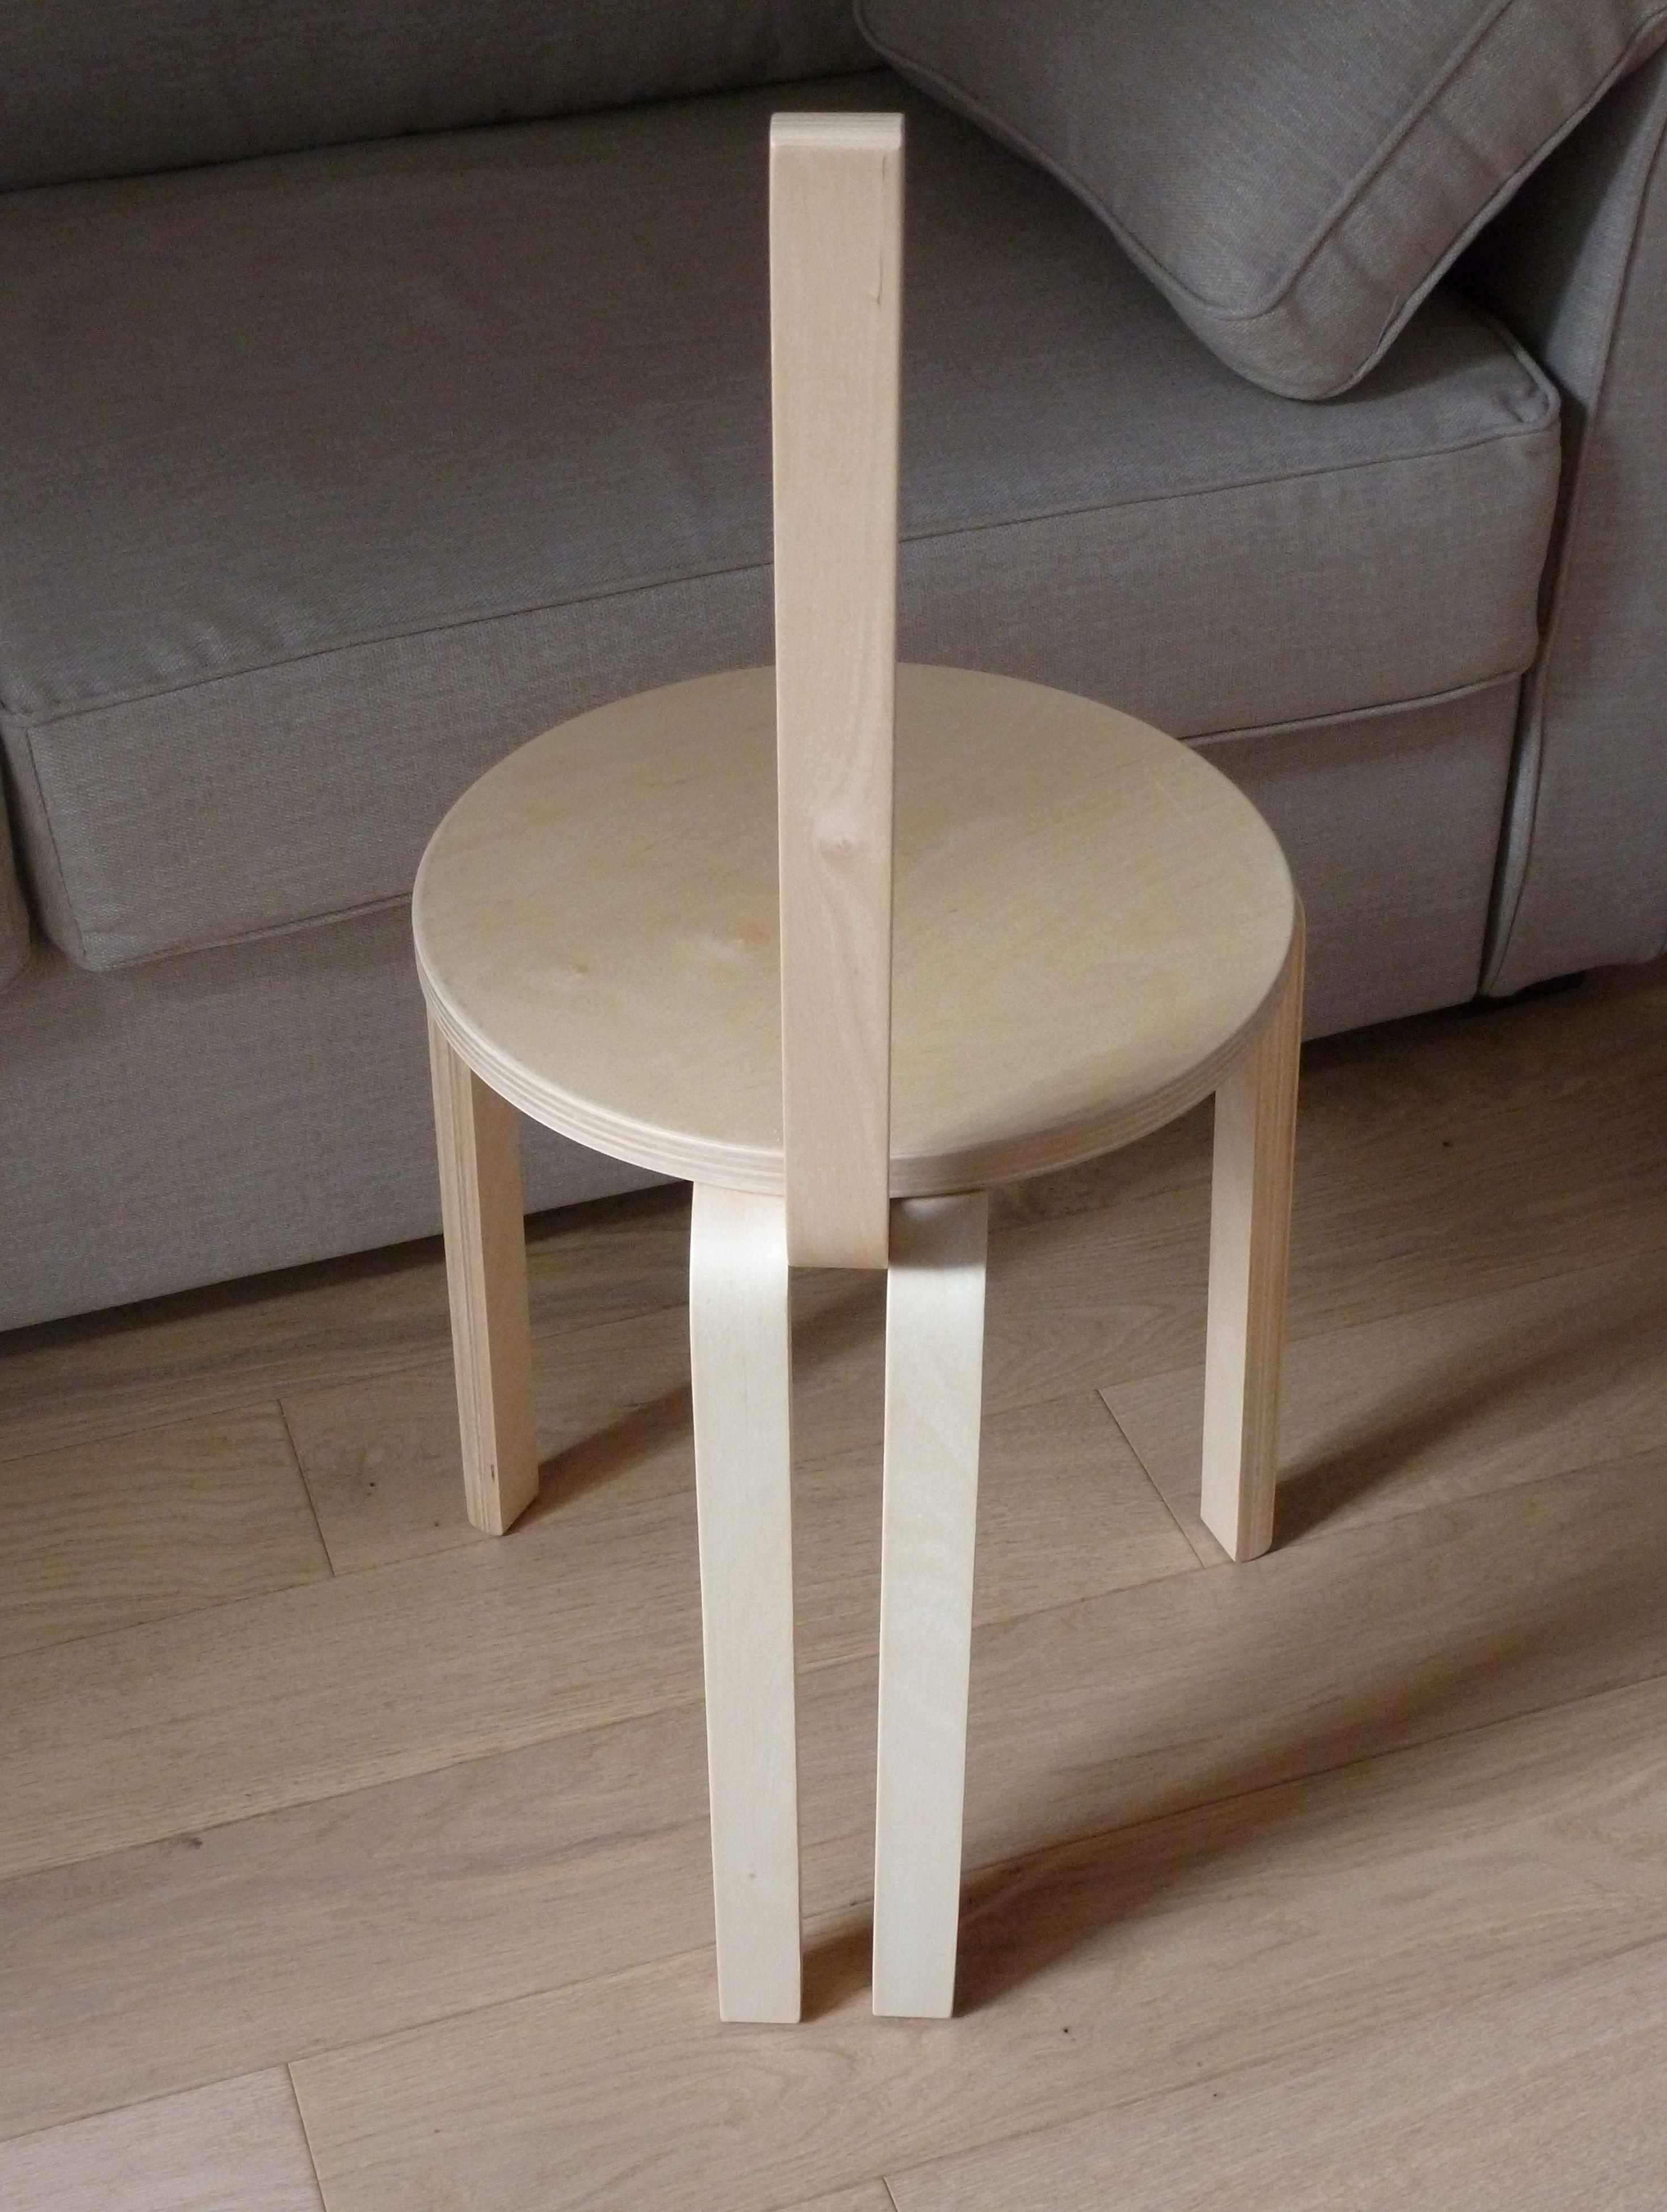 Tabouret Ergonomique Ikea